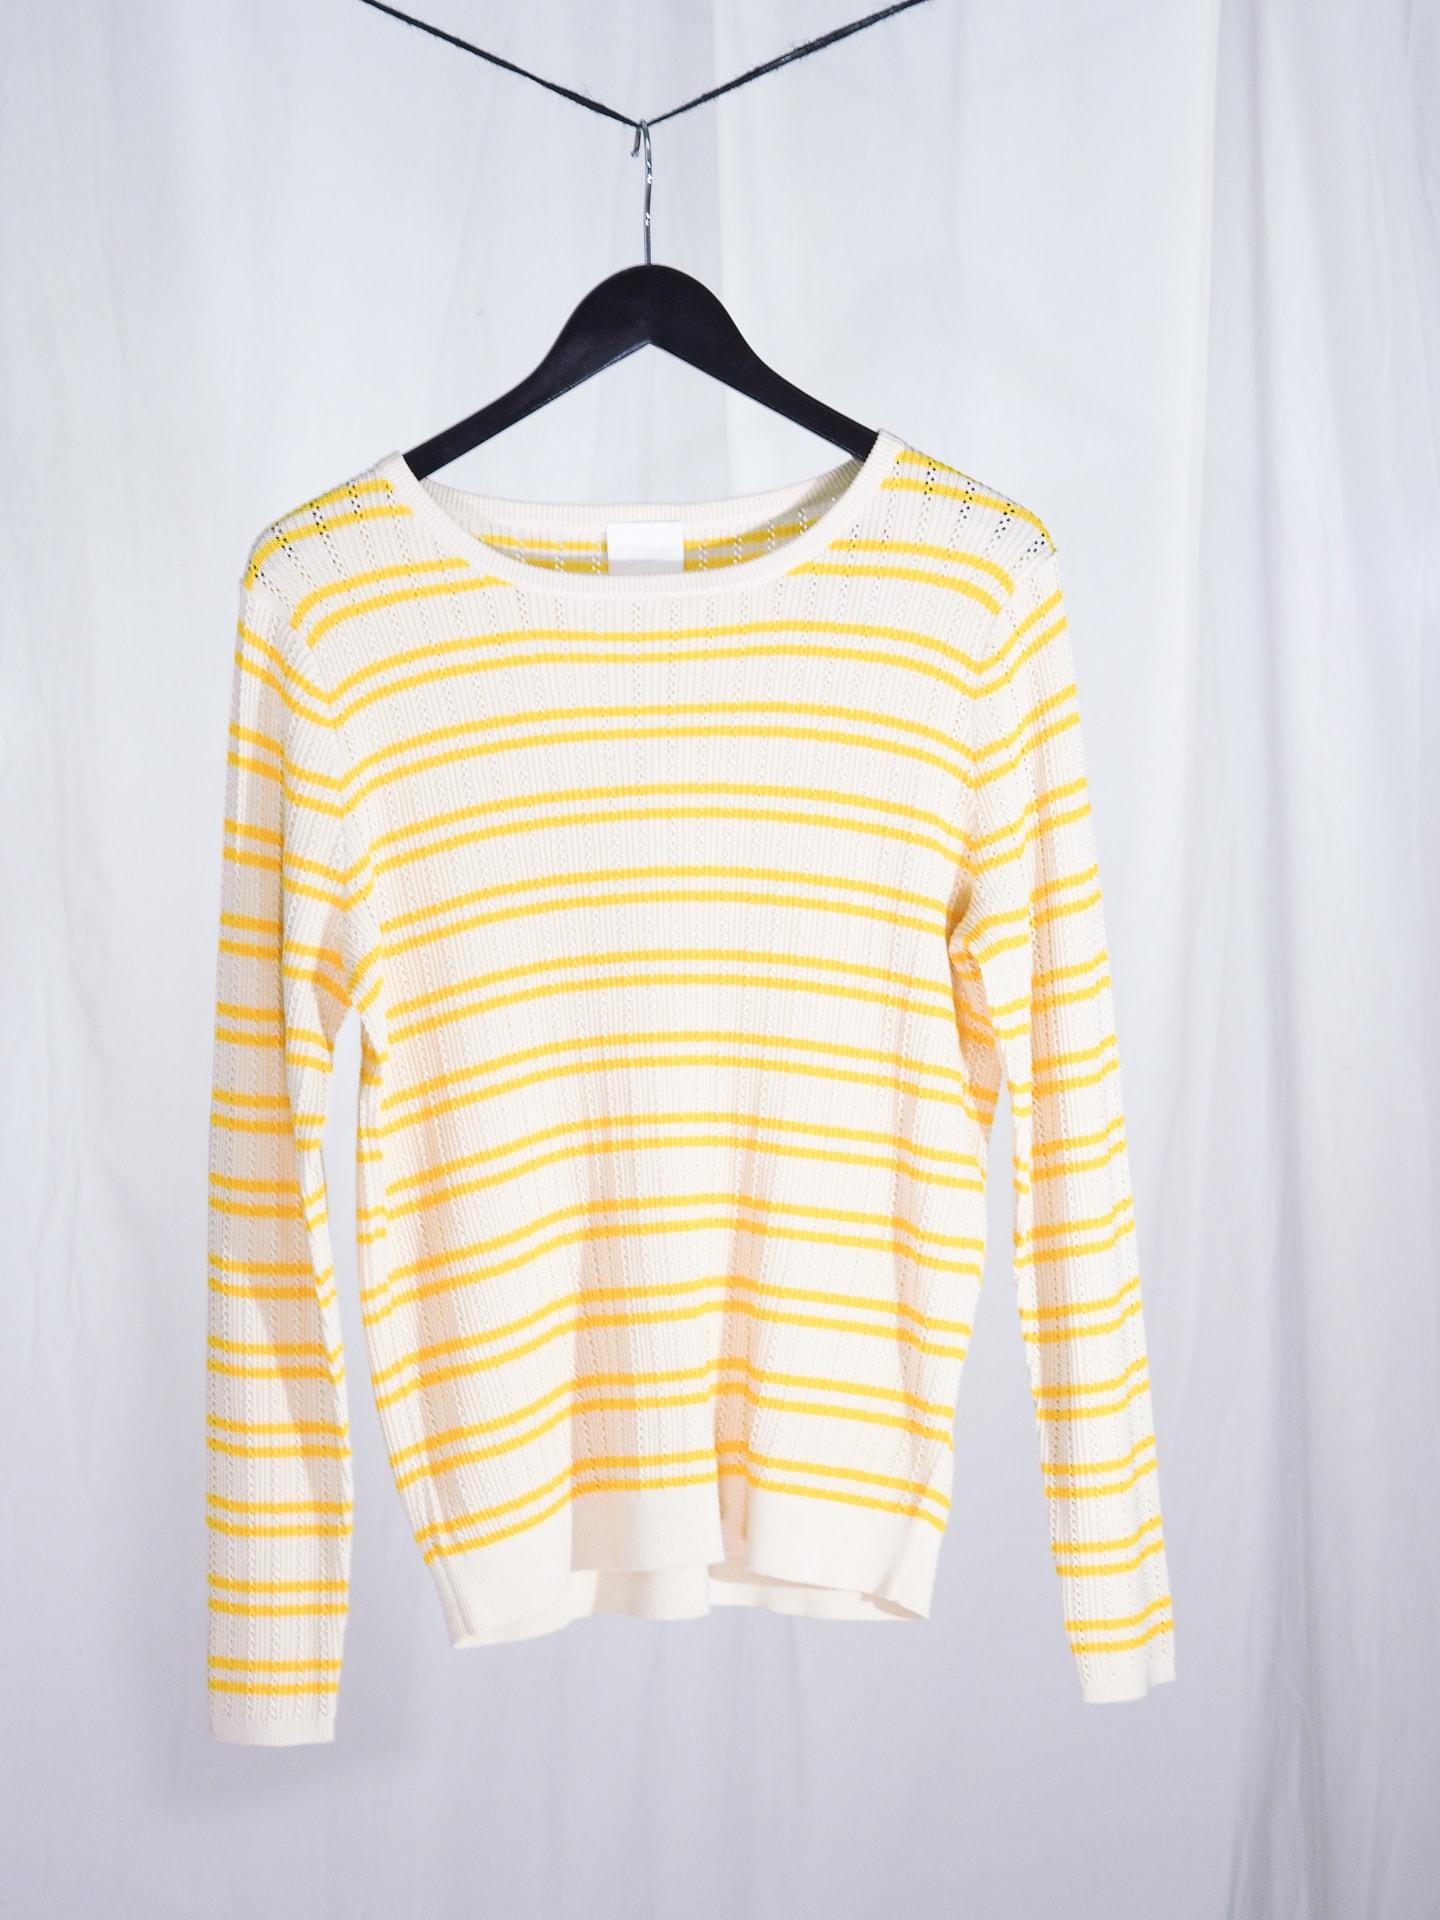 Structure blouse, ecru/yellow